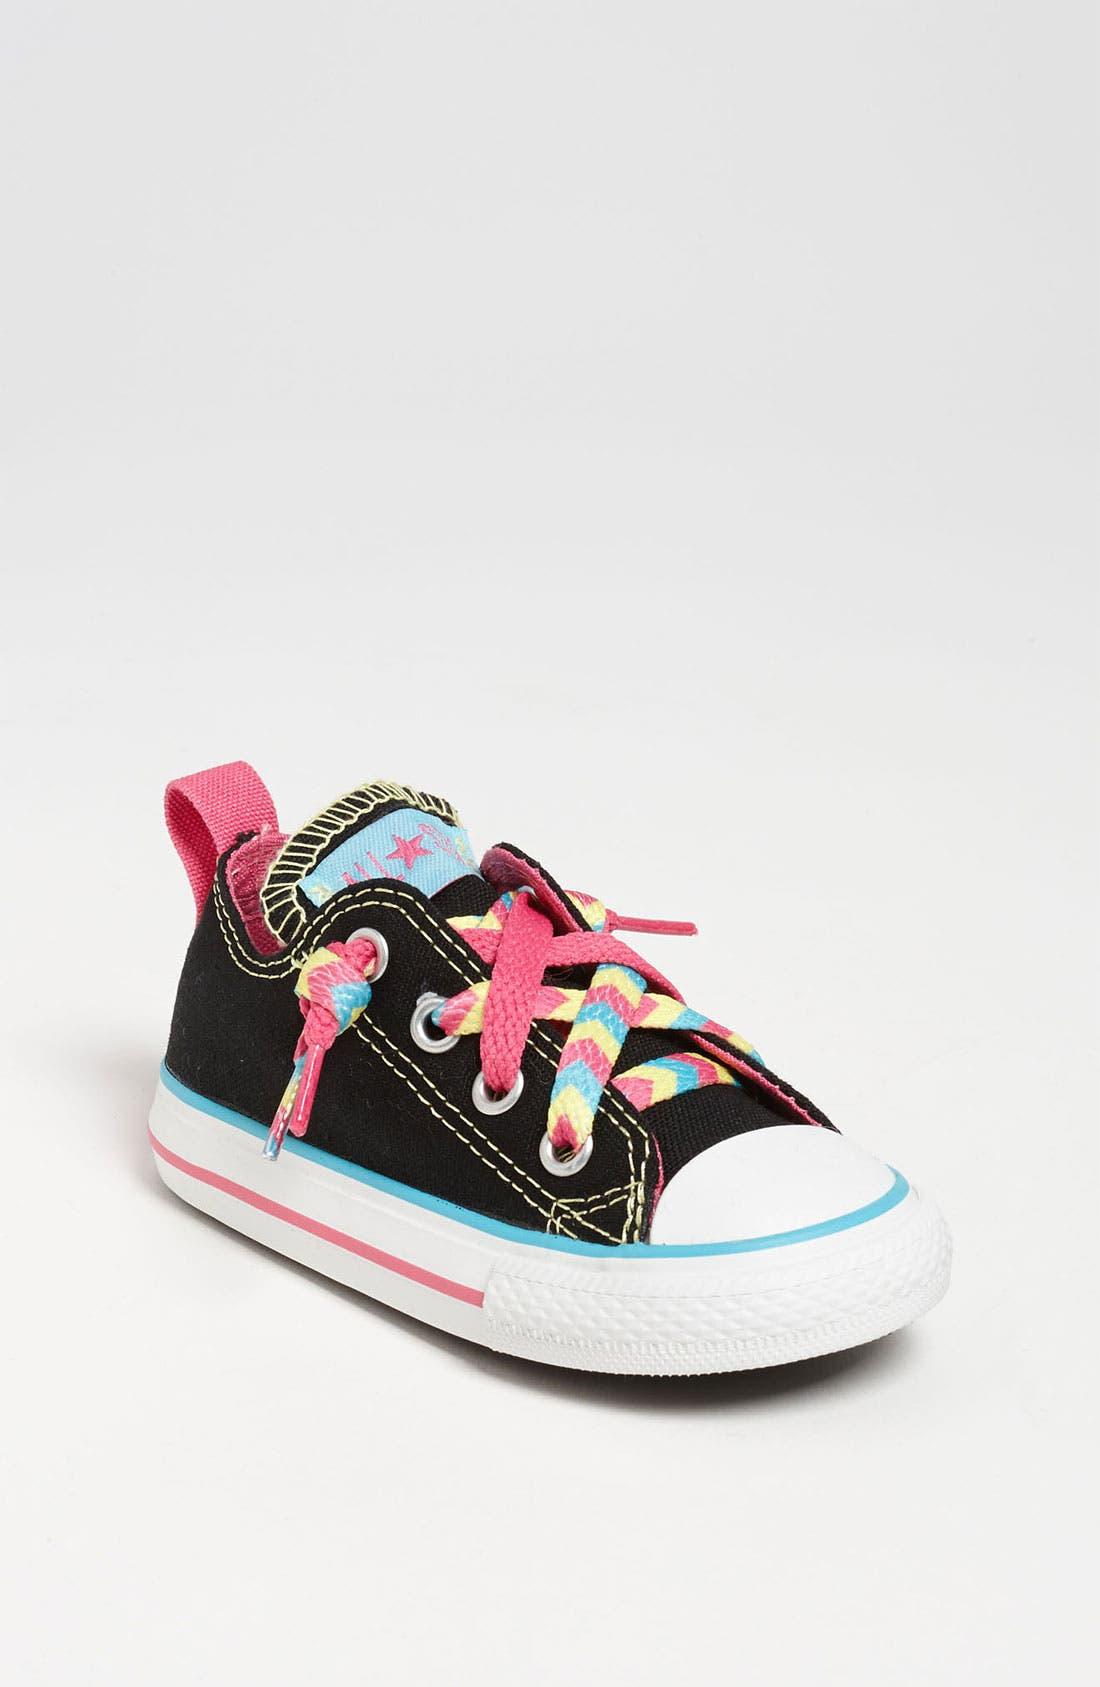 Alternate Image 1 Selected - Converse Chuck Taylor® All Star® 'Kriss N Kross' Sneaker (Baby, Walker & Toddler)